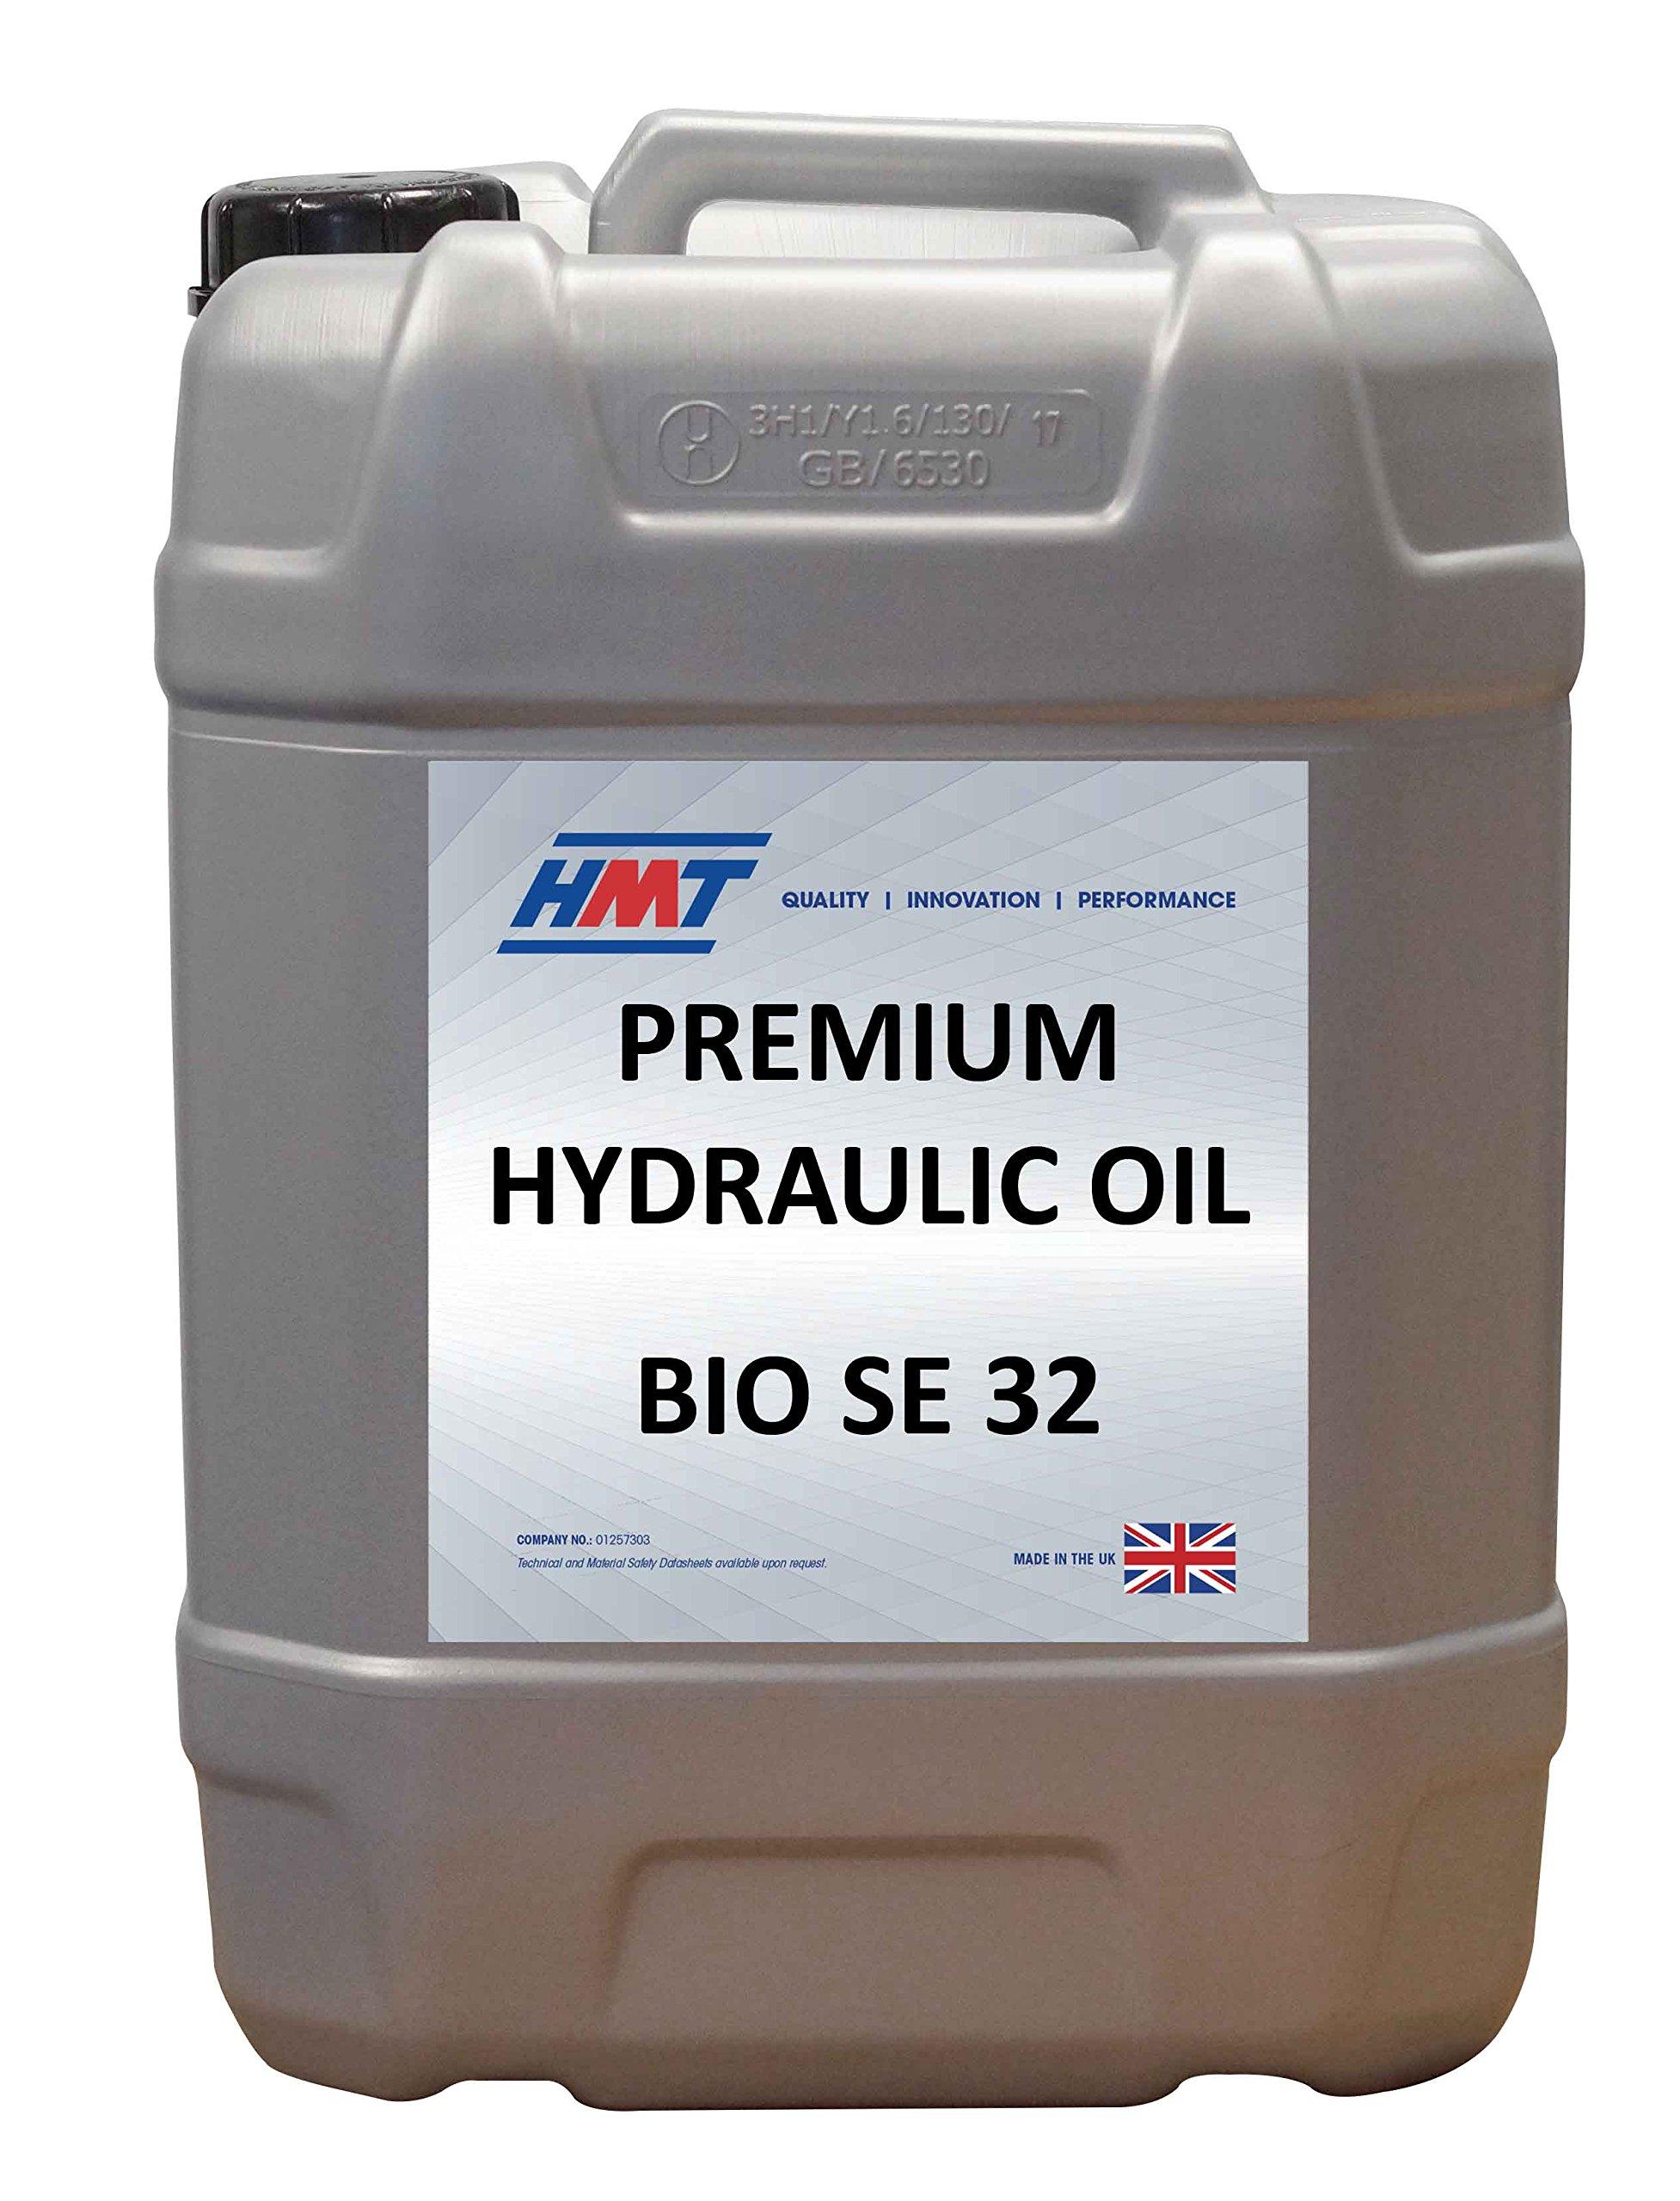 HMTH208 Premium Hydraulic Oil Biodegradable SE 32 - 20 Litre Plastic